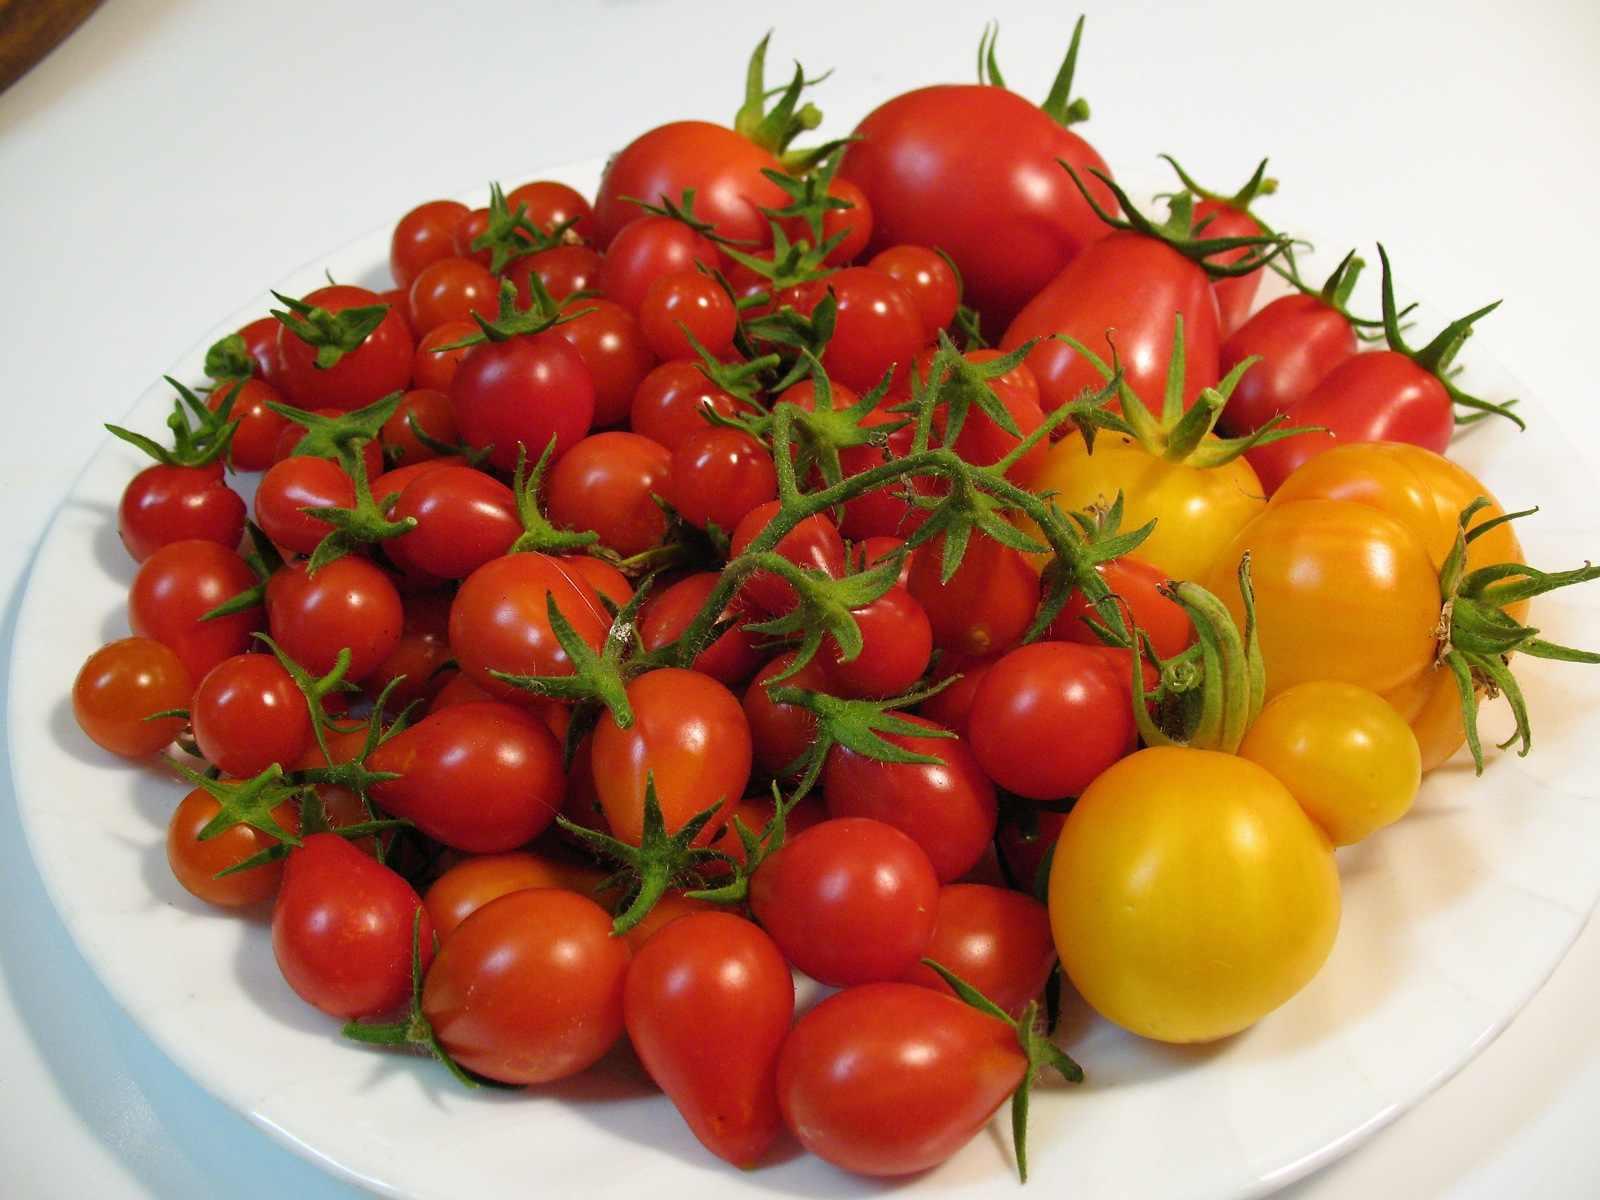 http://www.rostliny-semena.cz/galerie/rajcet_1353623434.jpg